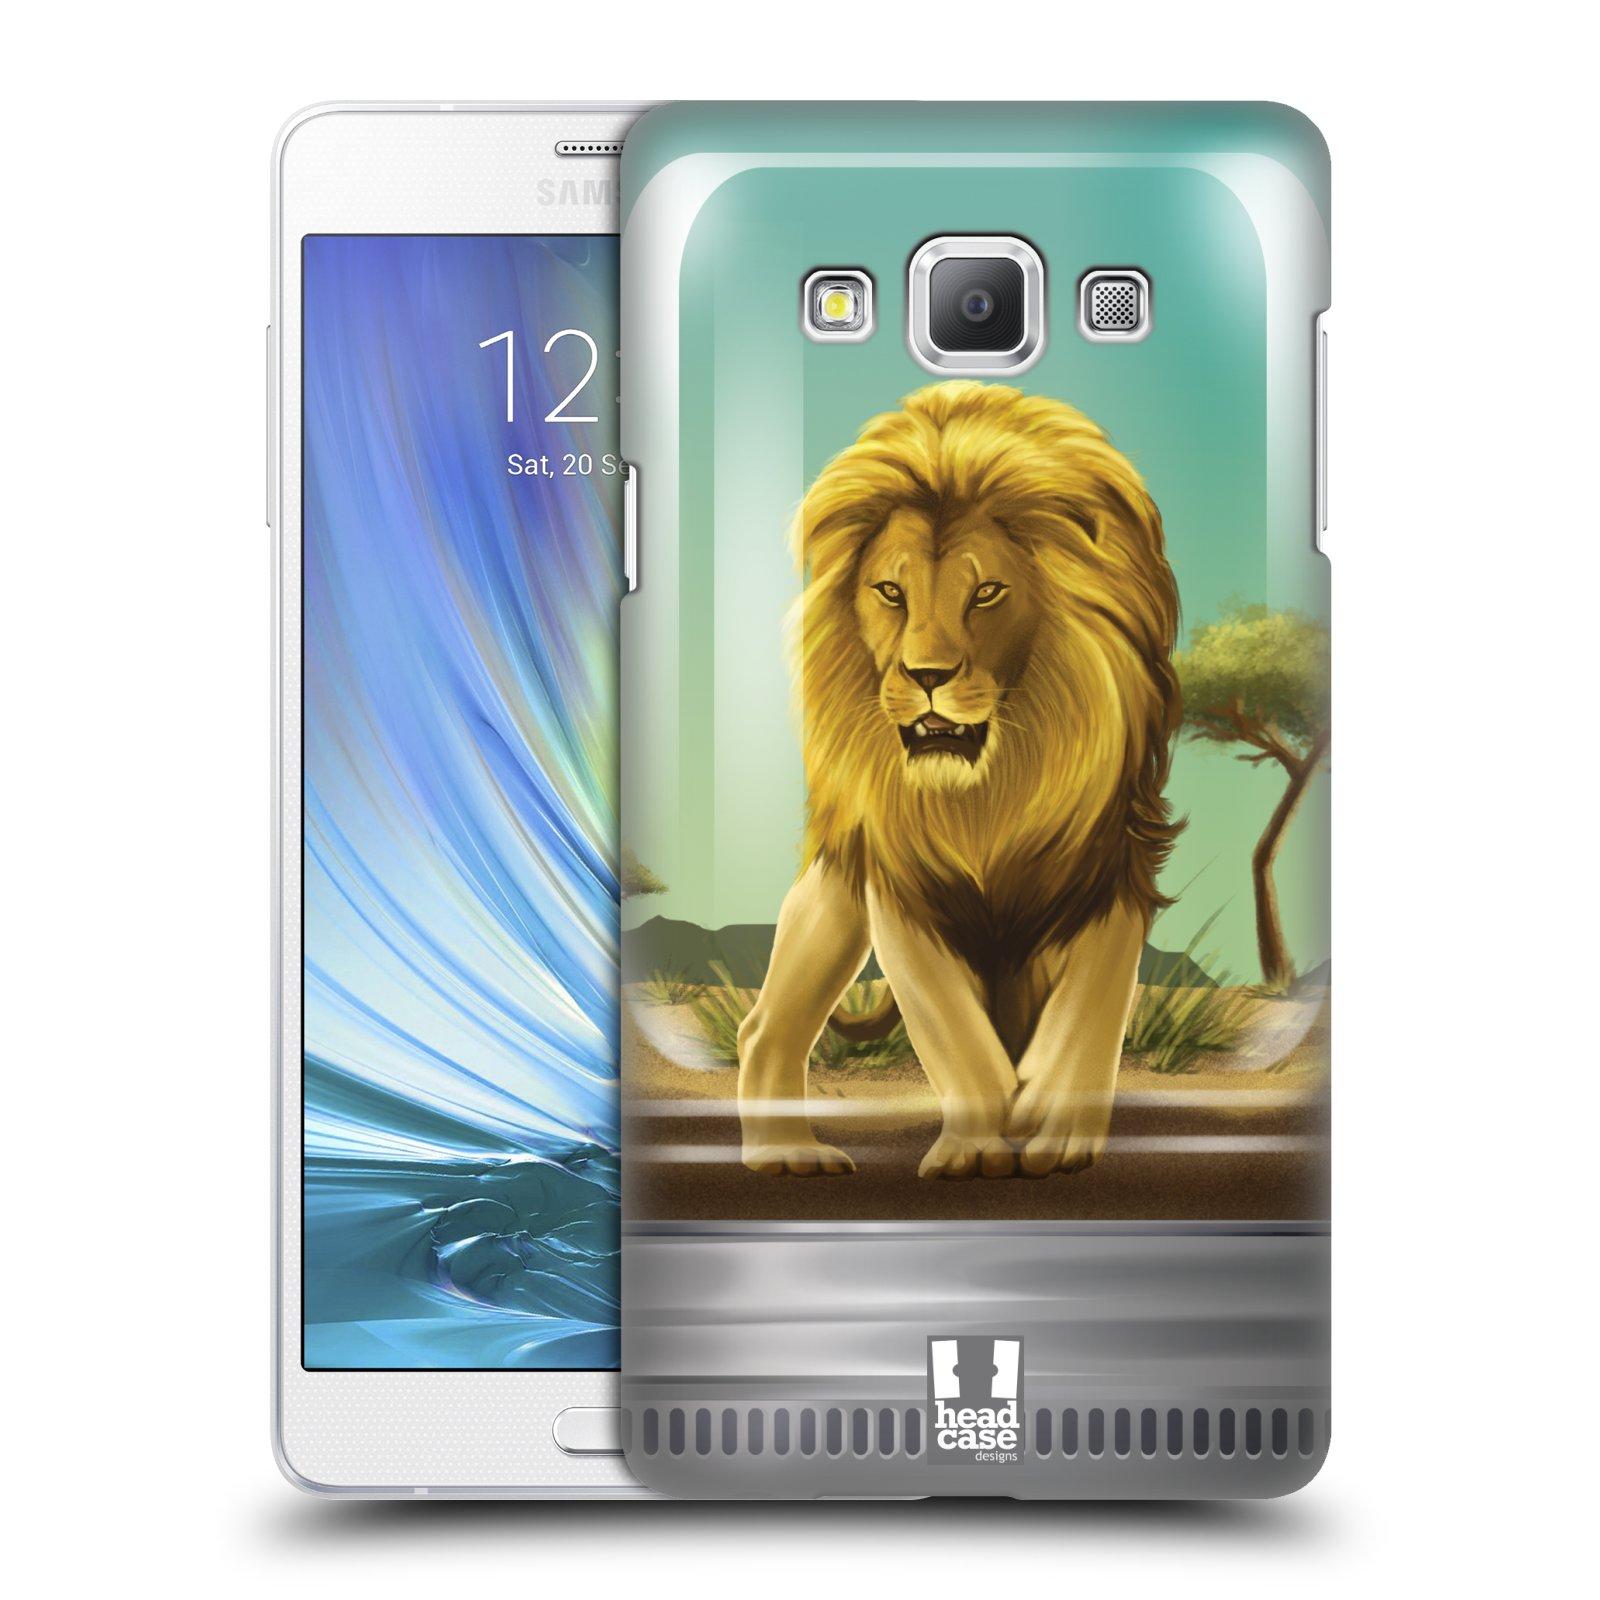 HEAD CASE plastový obal na mobil SAMSUNG GALAXY A7 vzor Zvířátka v těžítku lev